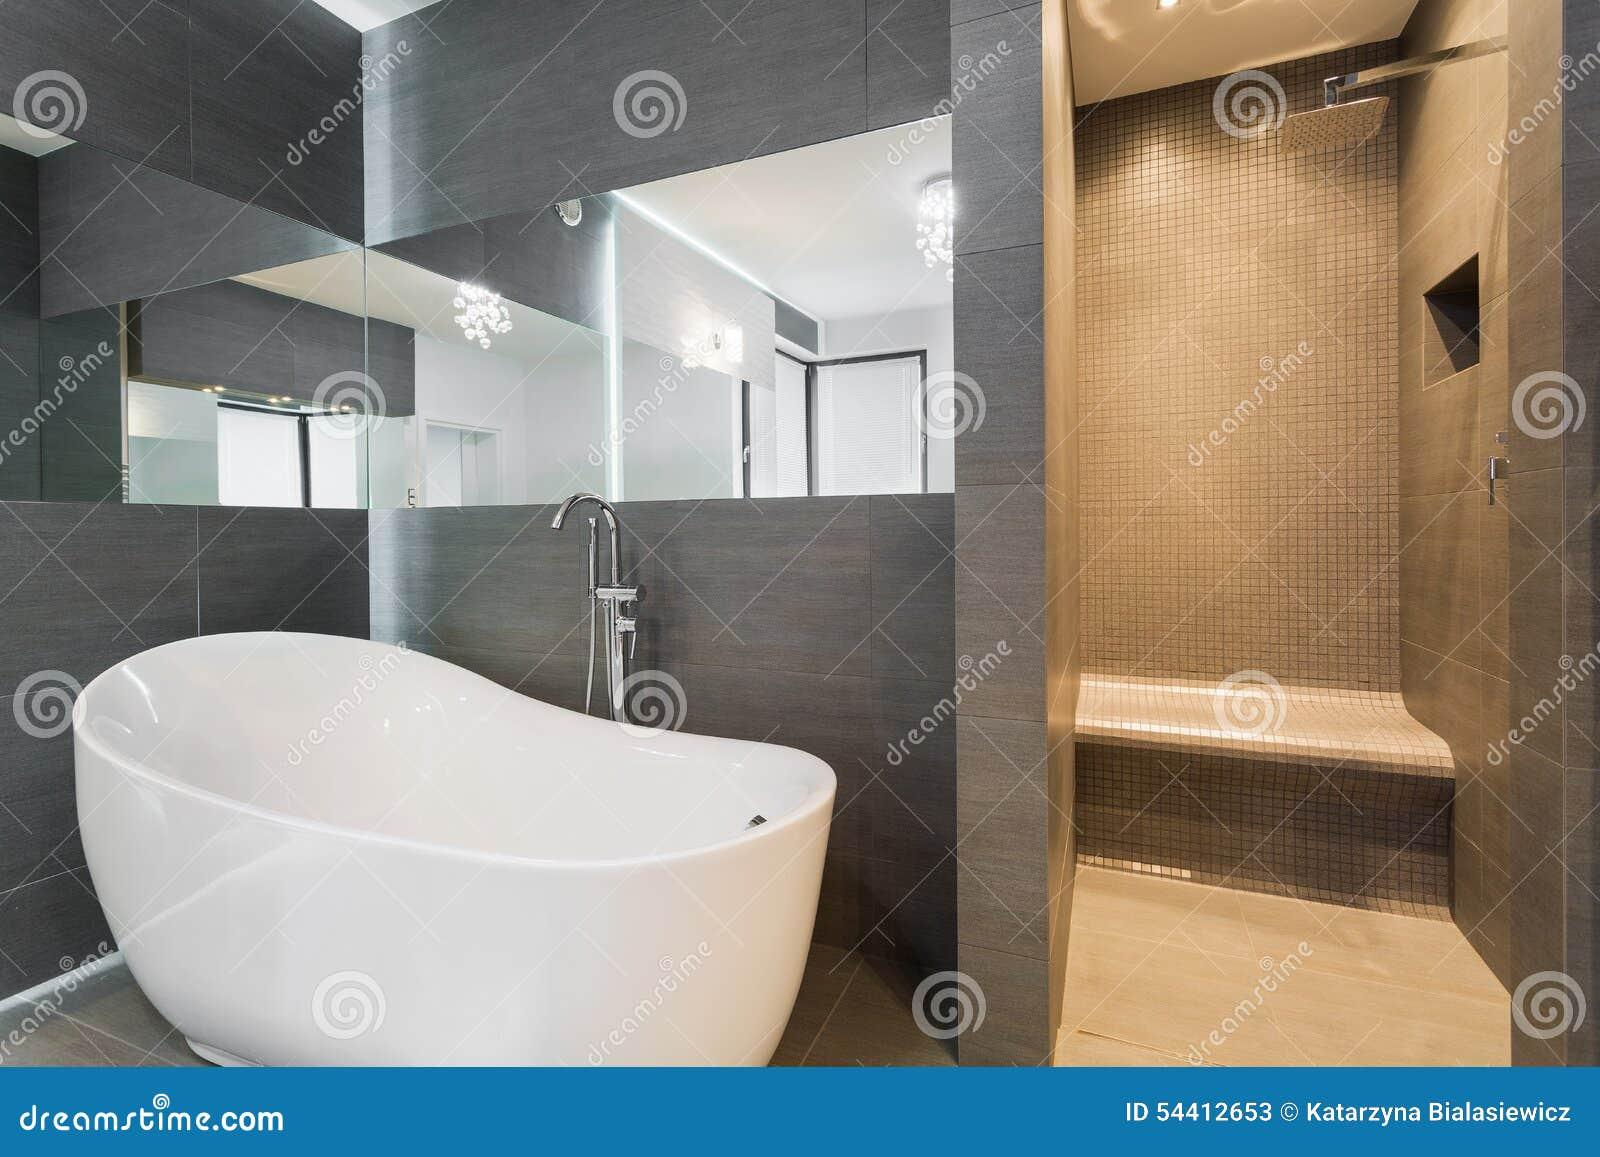 Badrum med badkaret och duschen arkivfoto   bild: 54412653